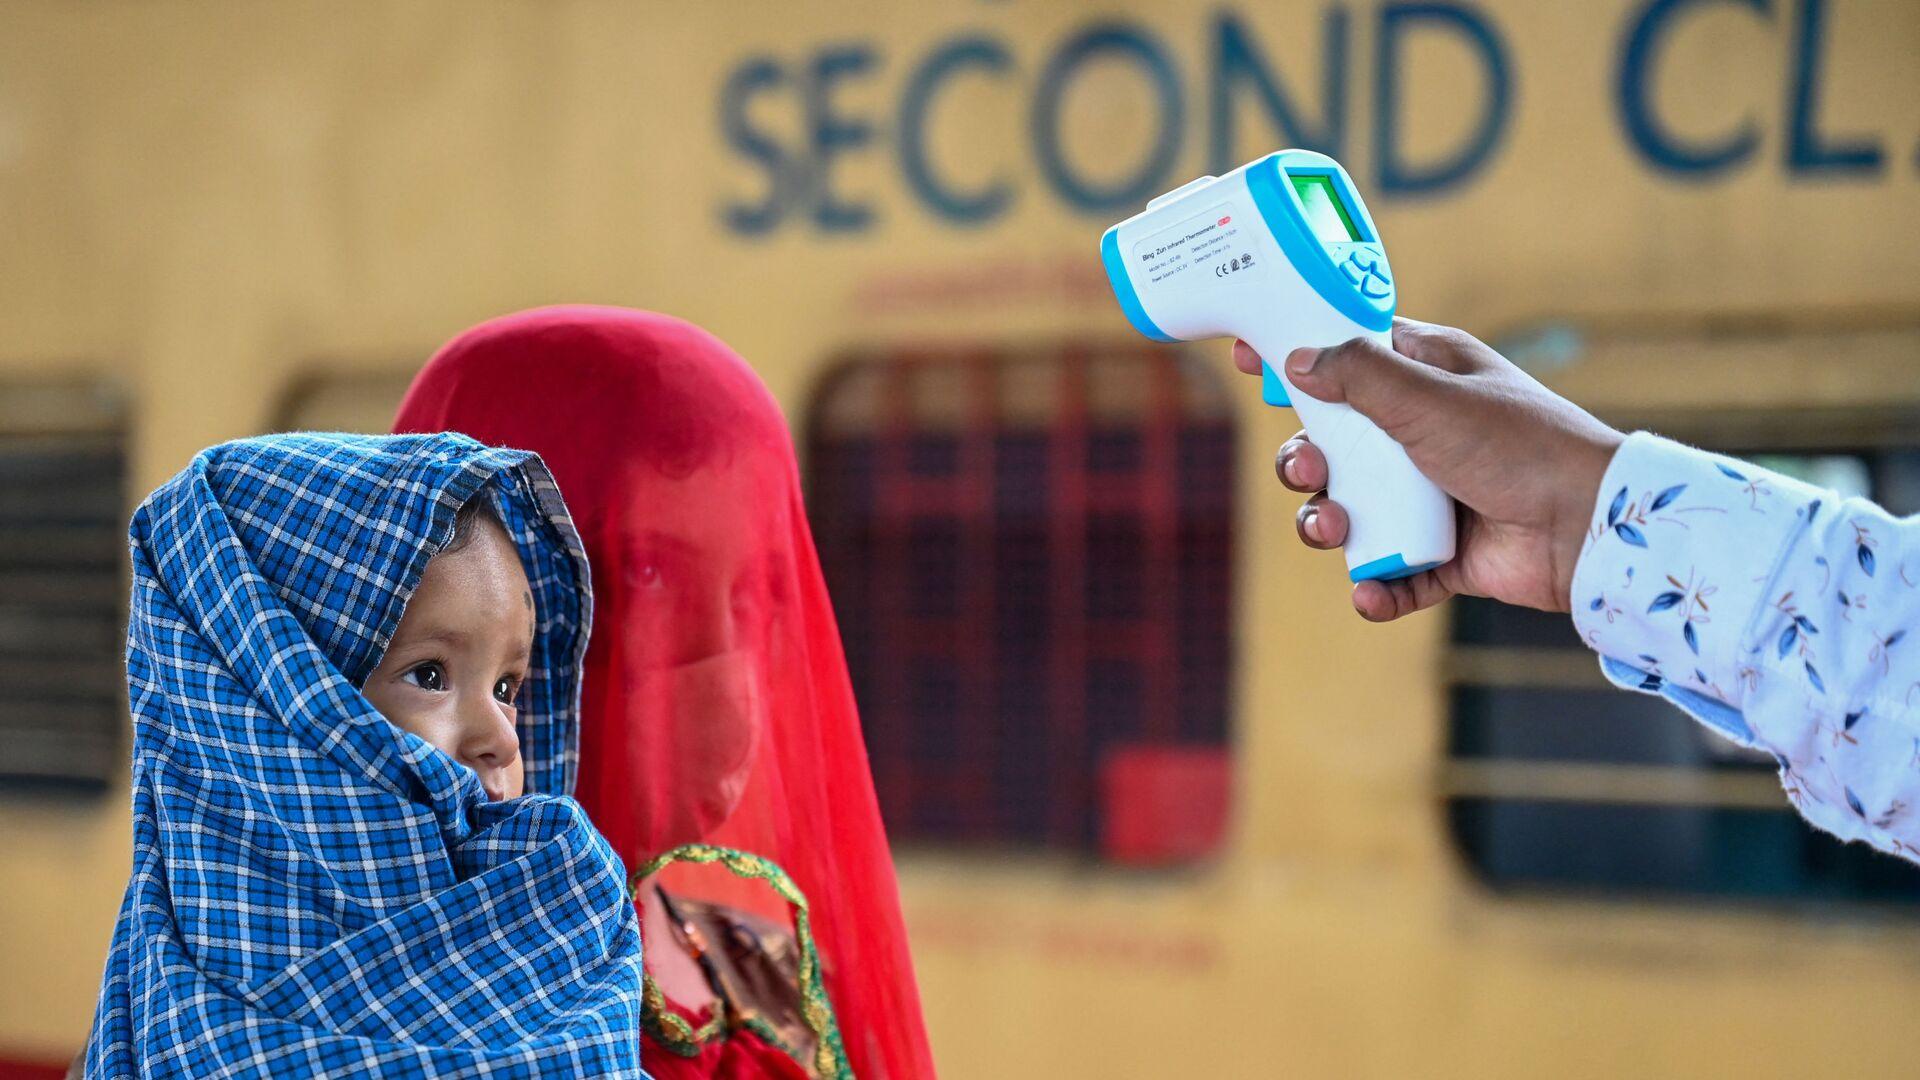 Медицинский работник проверяет температуру тела ребенка во время скрининга на коронавирус Covid-19 в Мумбаи - Sputnik Česká republika, 1920, 20.06.2021